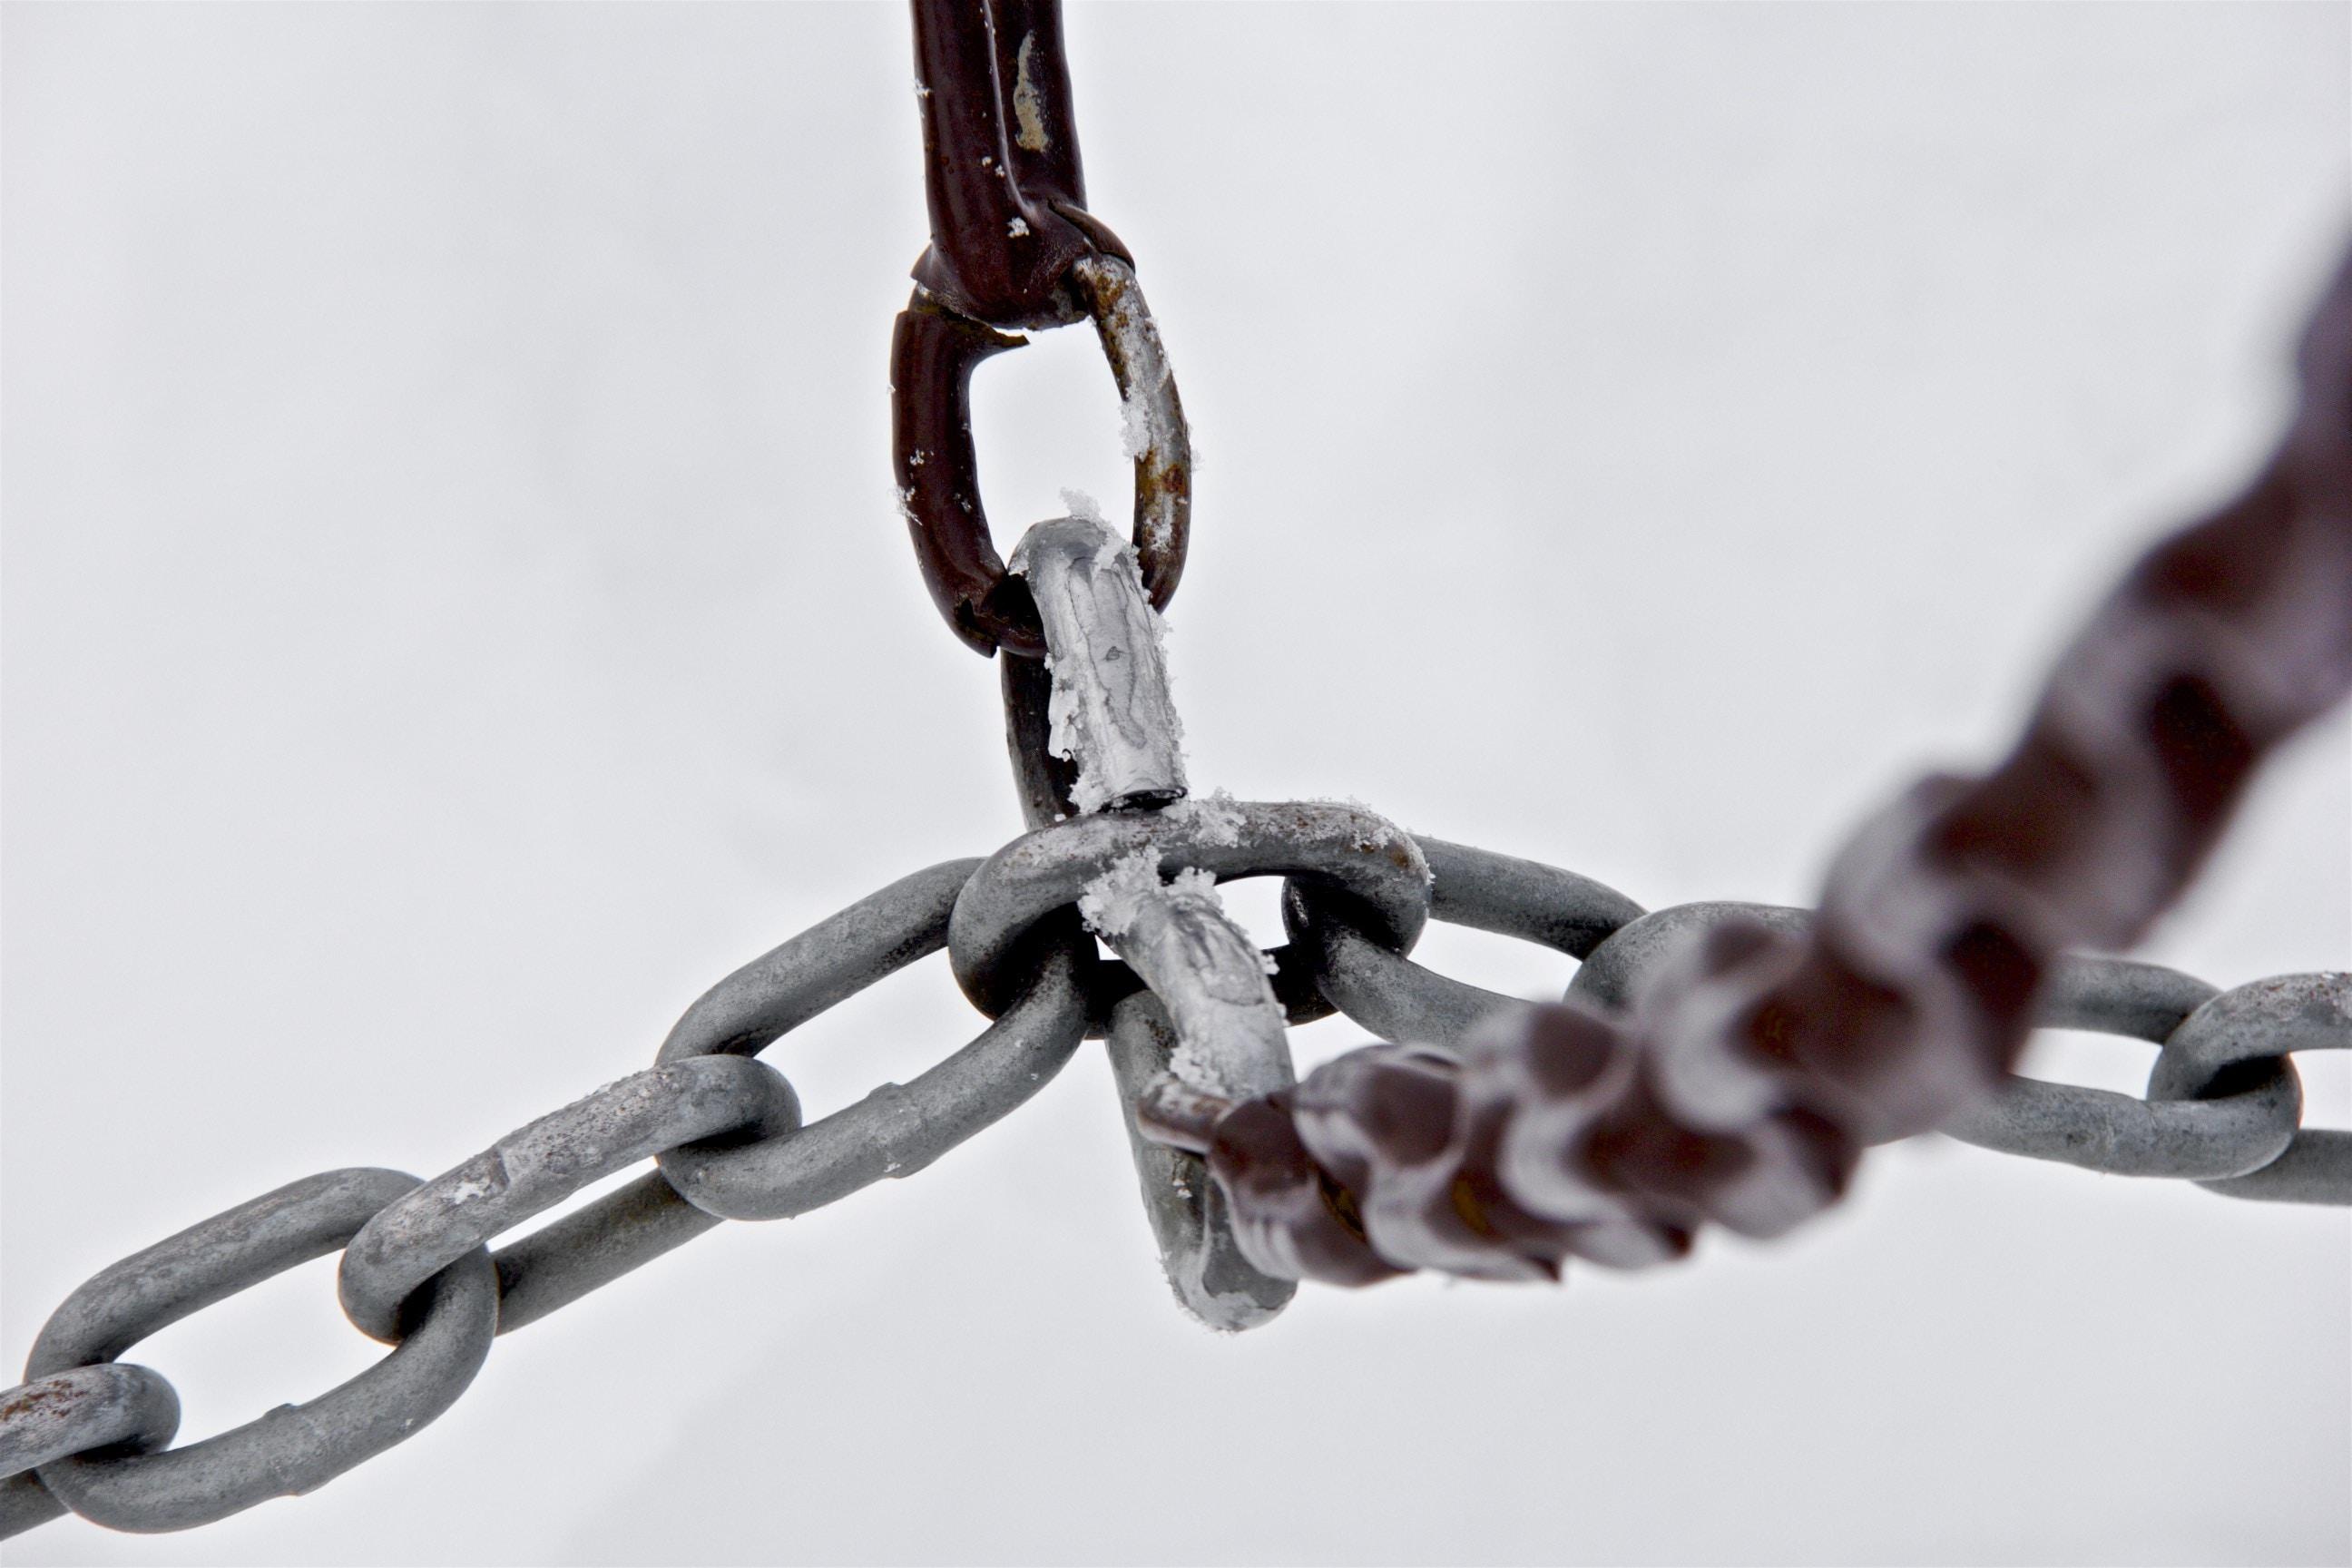 selective focus photograph of gray metal chains